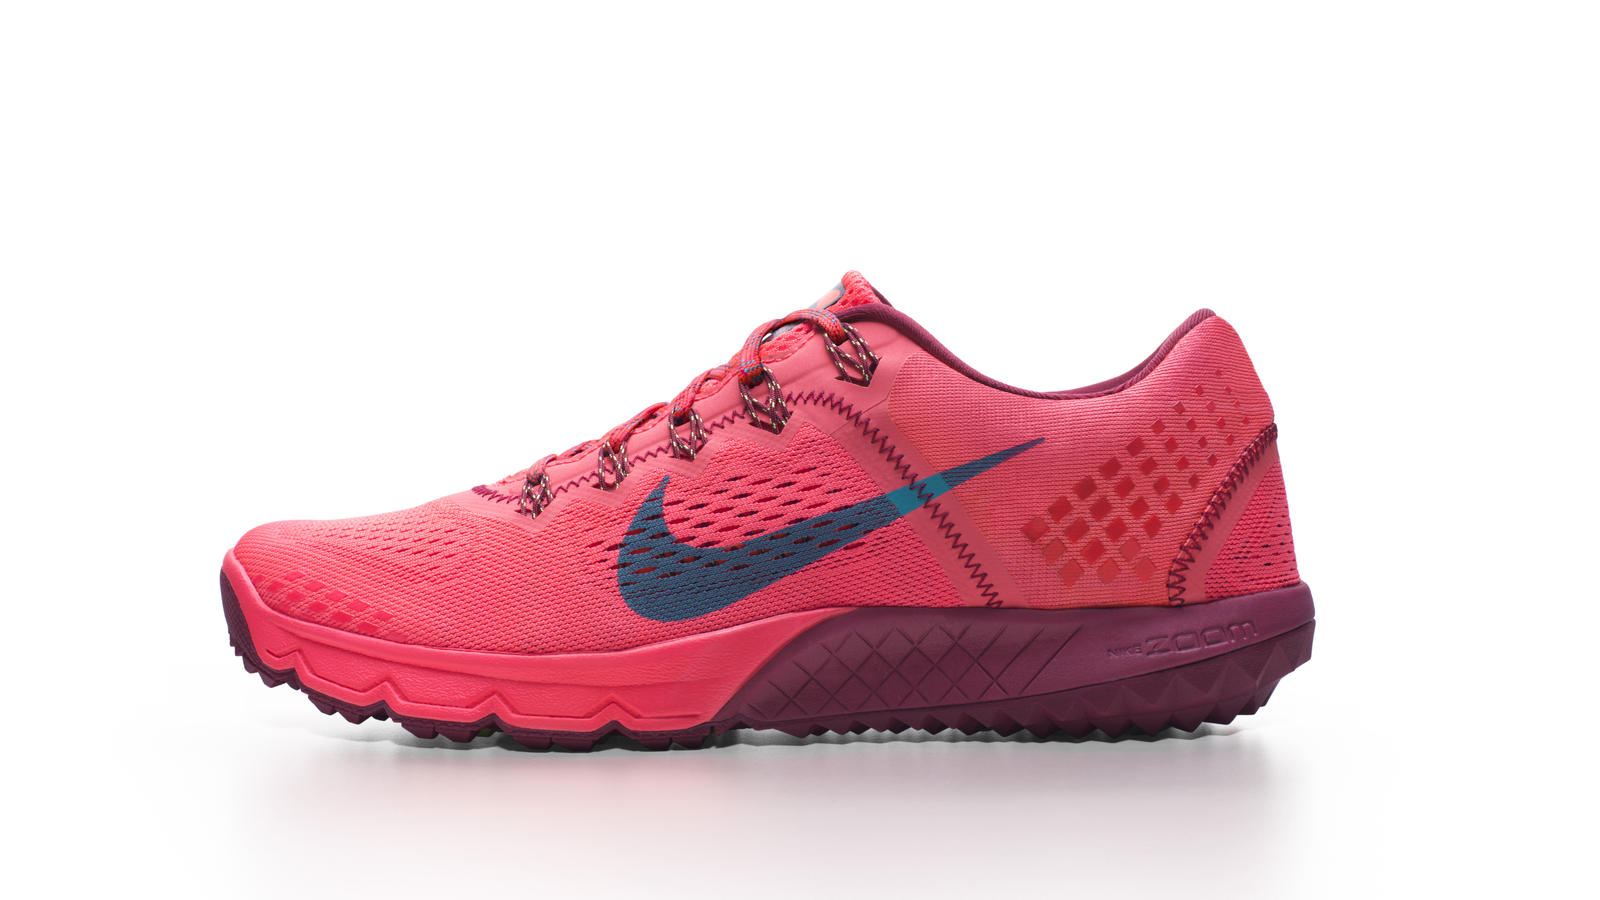 Nike Zoom Terra Kiger W Profile